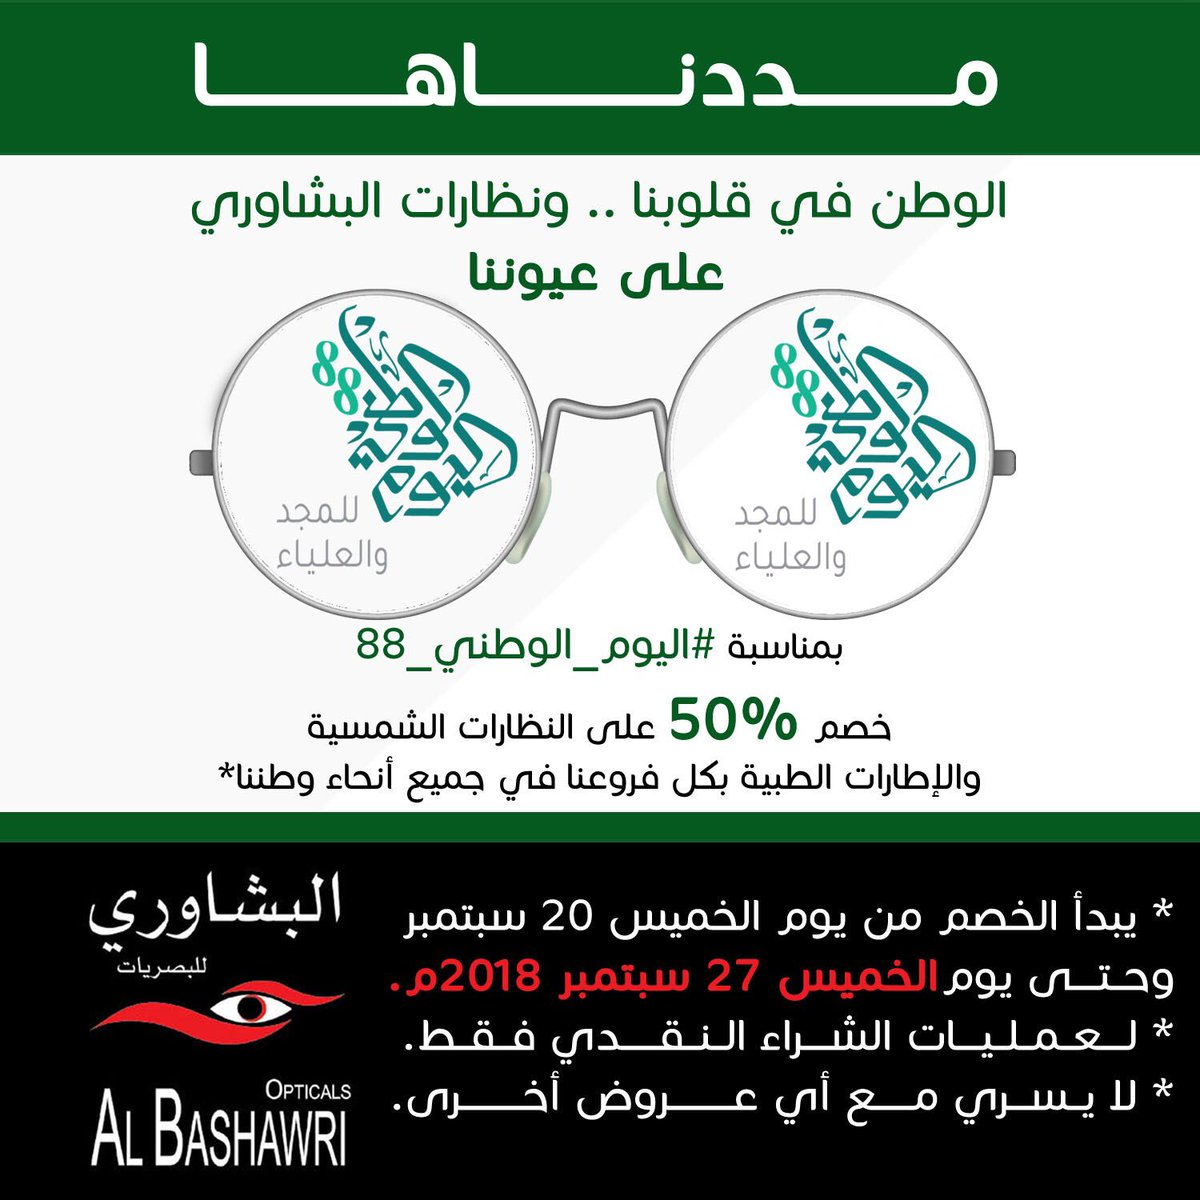 1e6ca748d البشاوري للبصريات (@AlBashawri_Opt) | Twitter